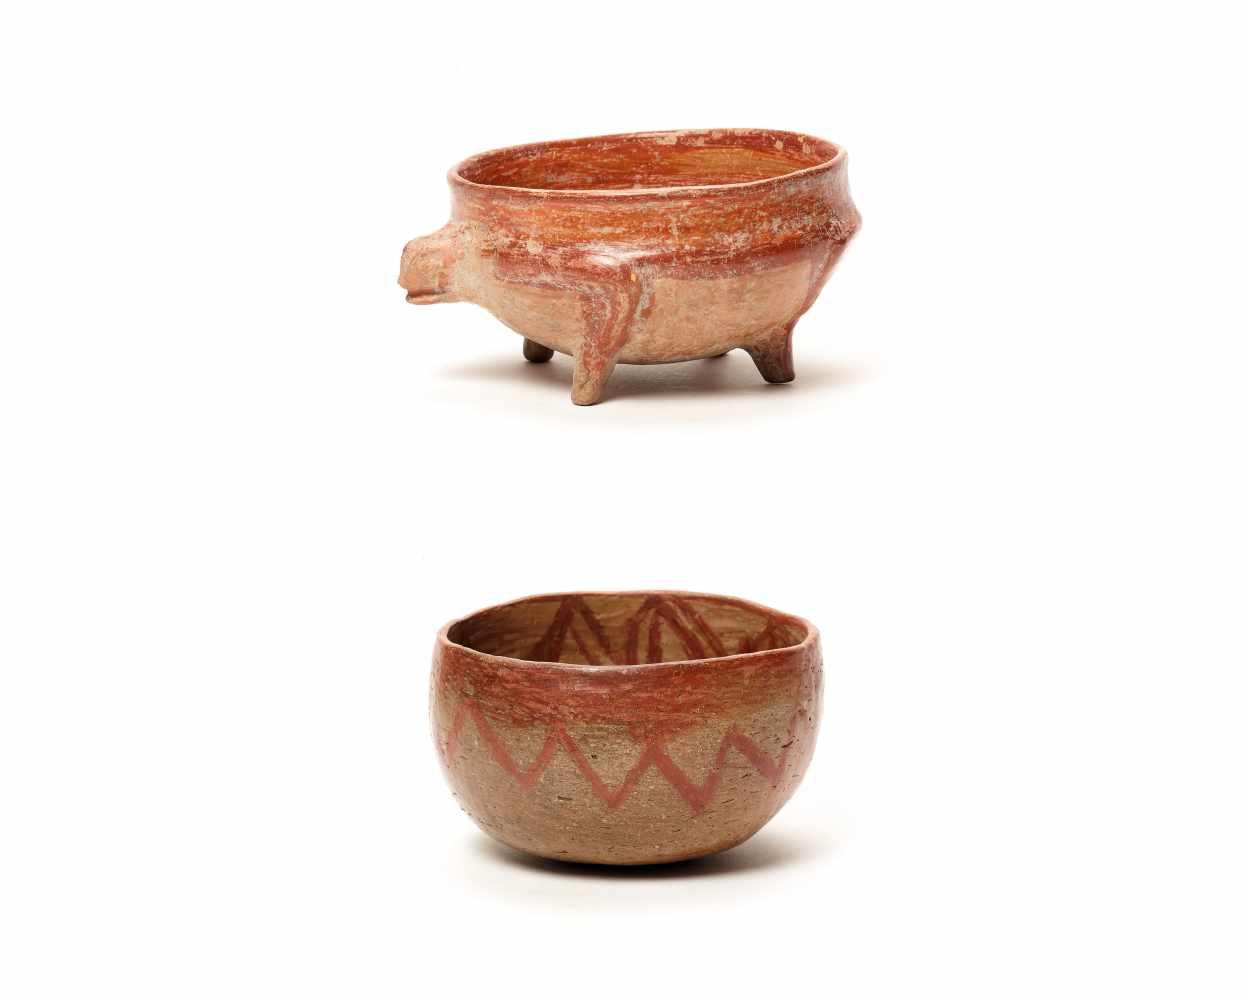 TWO BOWLS – PROBABLY CHARCHI CULTURE, ECUADOR, C. 850 – 1500 ADFired clayProbably Charchi culture,